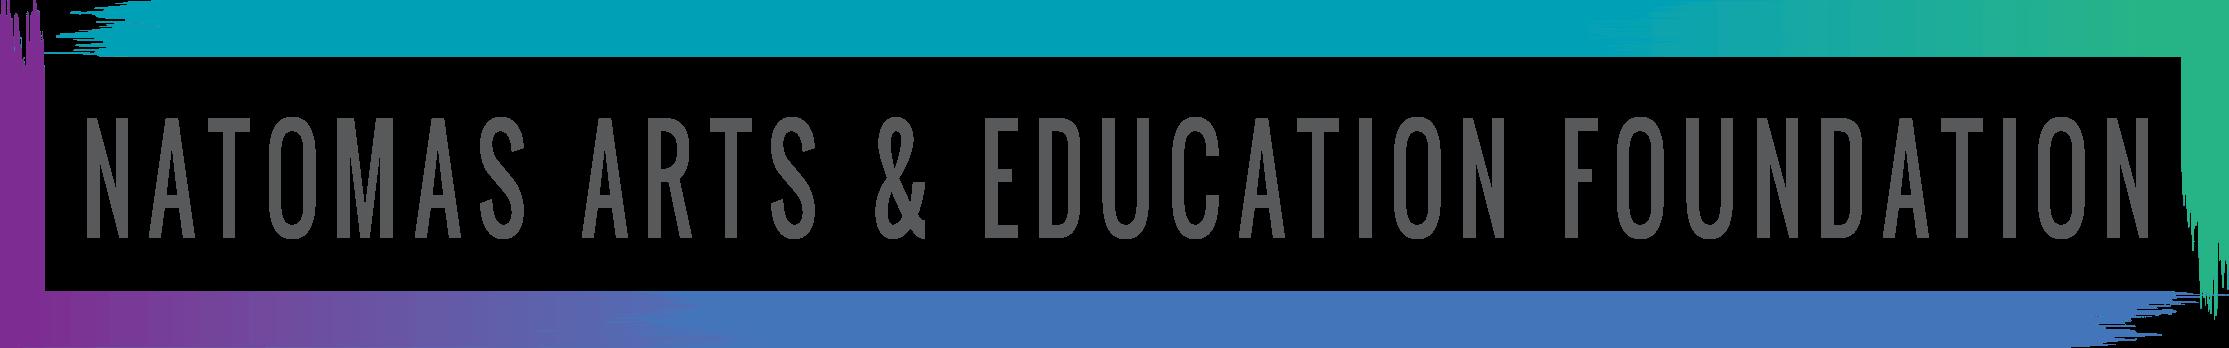 Scholarships | Natomas Arts & Education Foundation